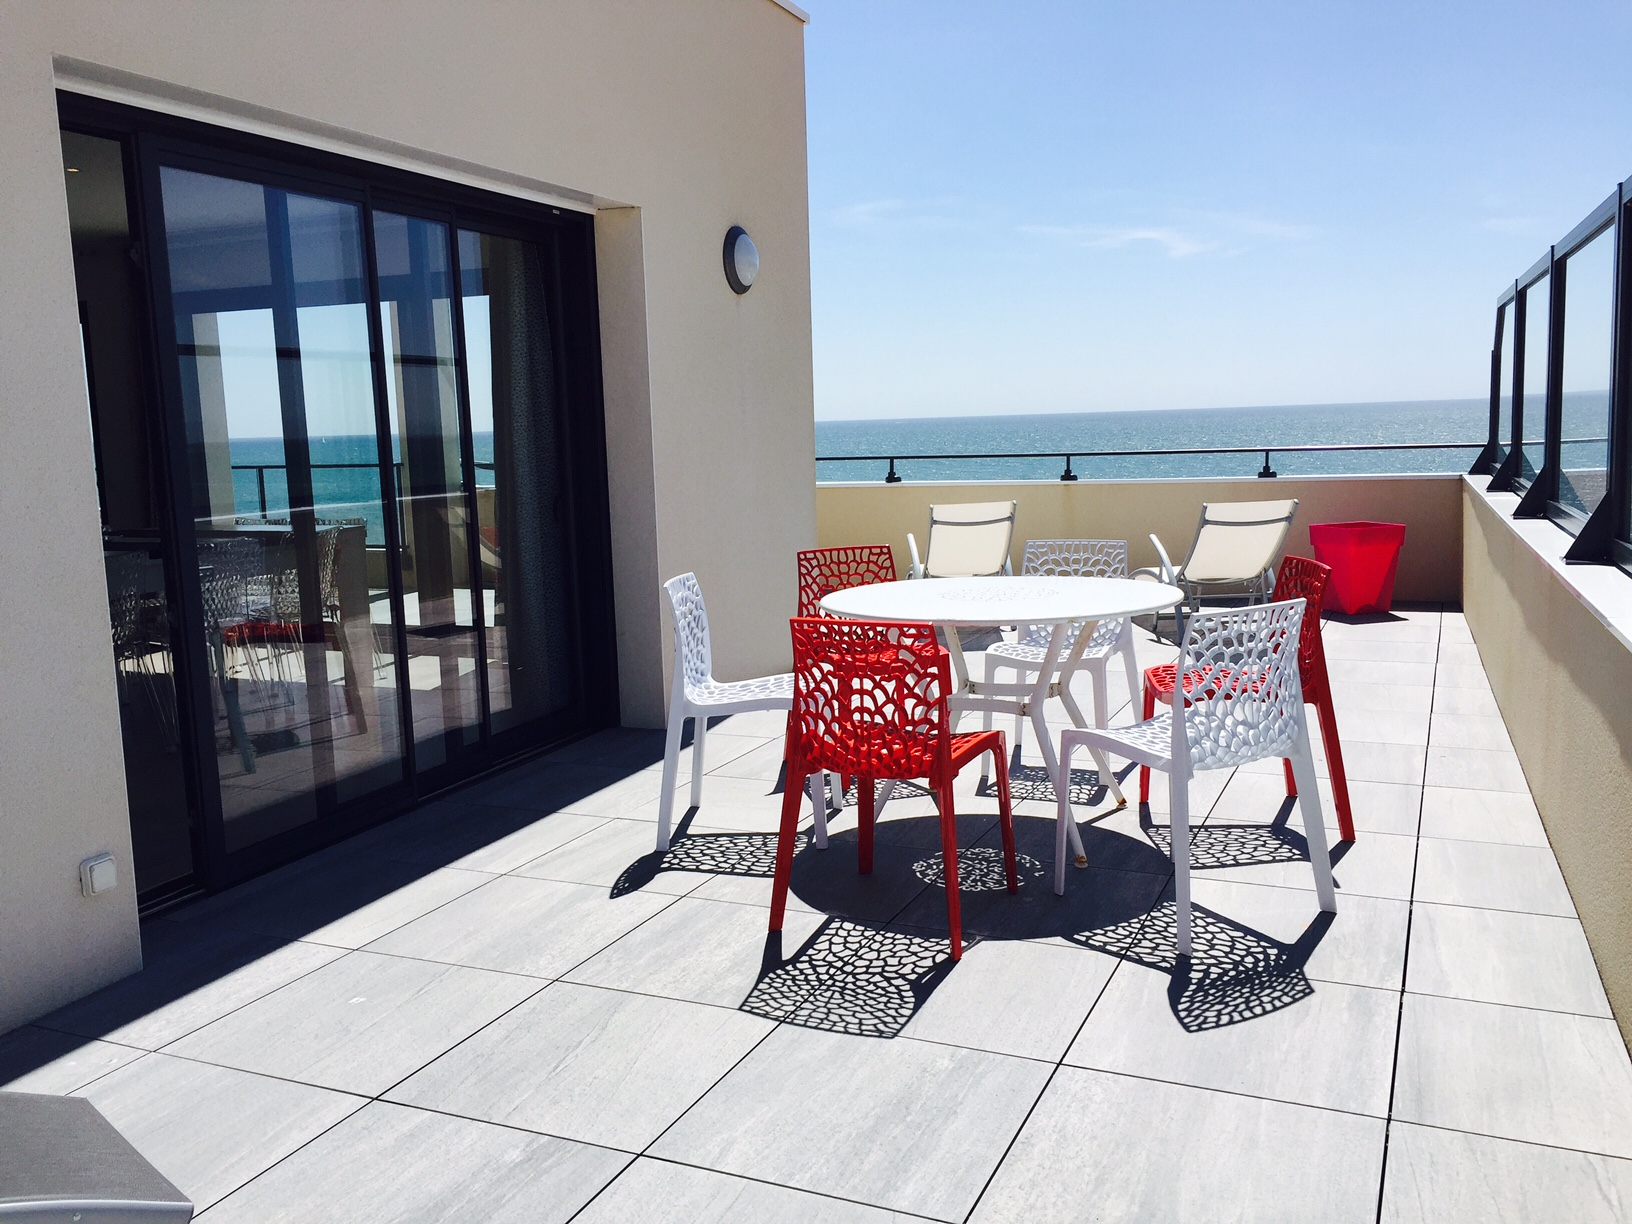 terrasse de la villa piscine intrieure prive et chauffe